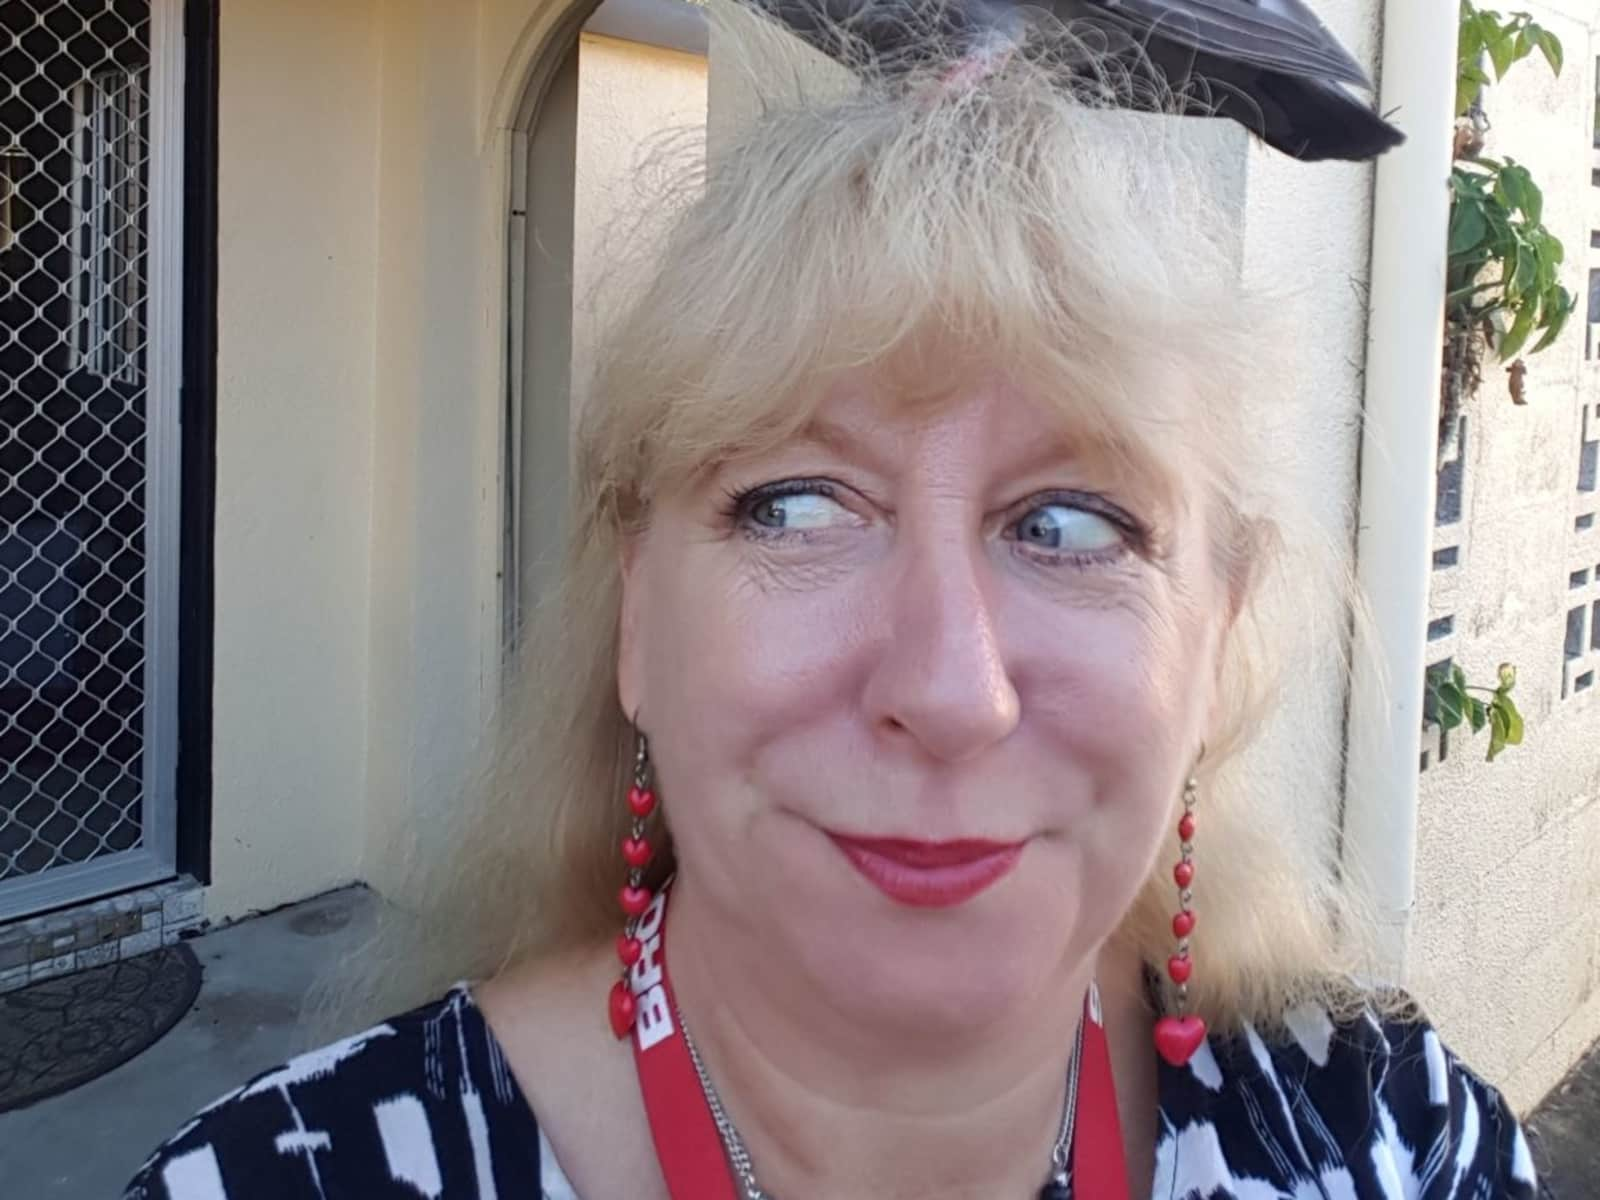 Colleen from Gold Coast, Queensland, Australia